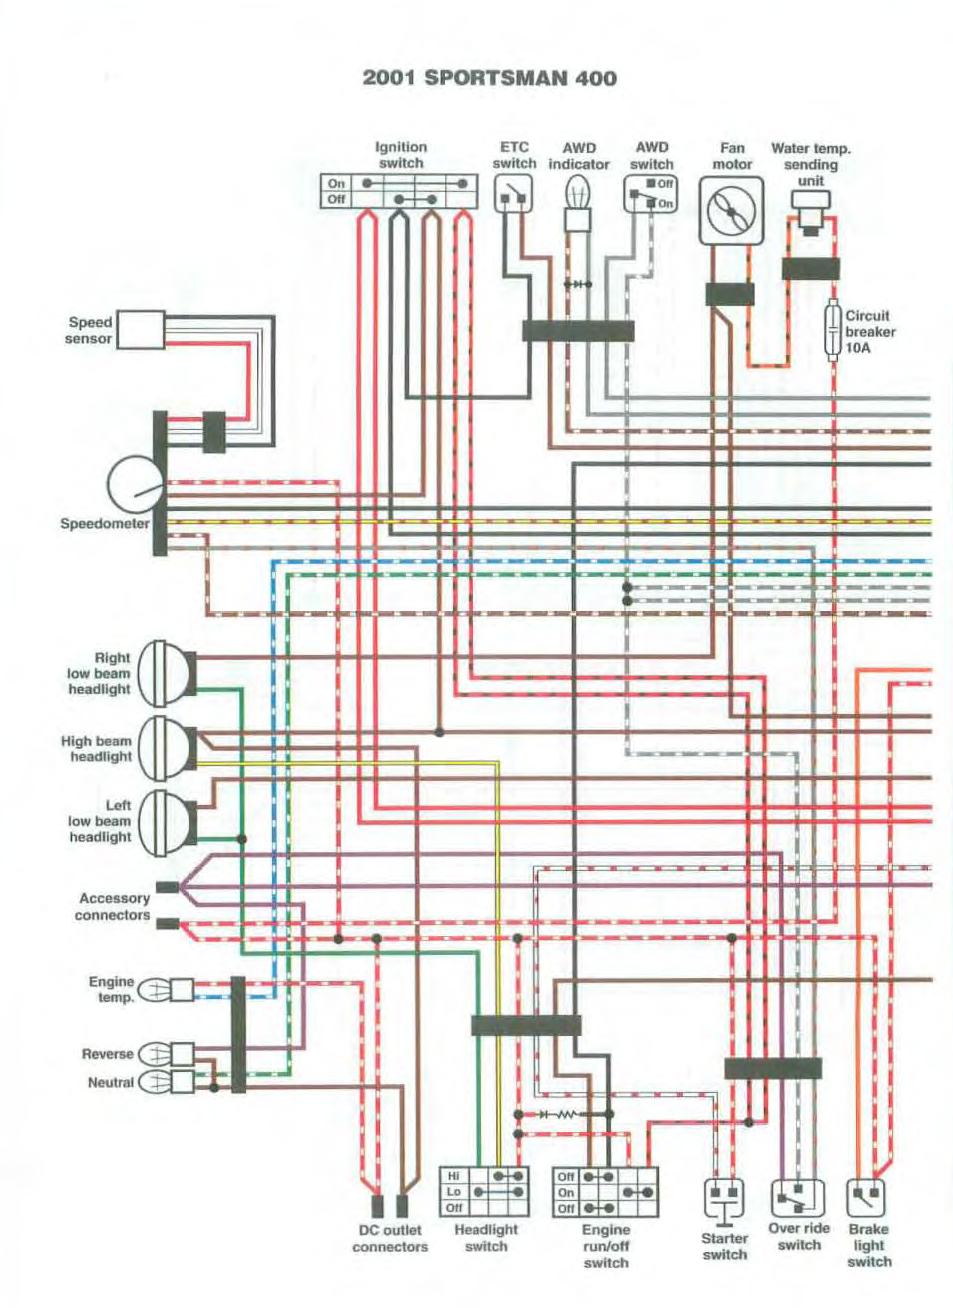 Sportsman 500 wiring diagram | Polaris ATV ForumPolaris ATV Forum